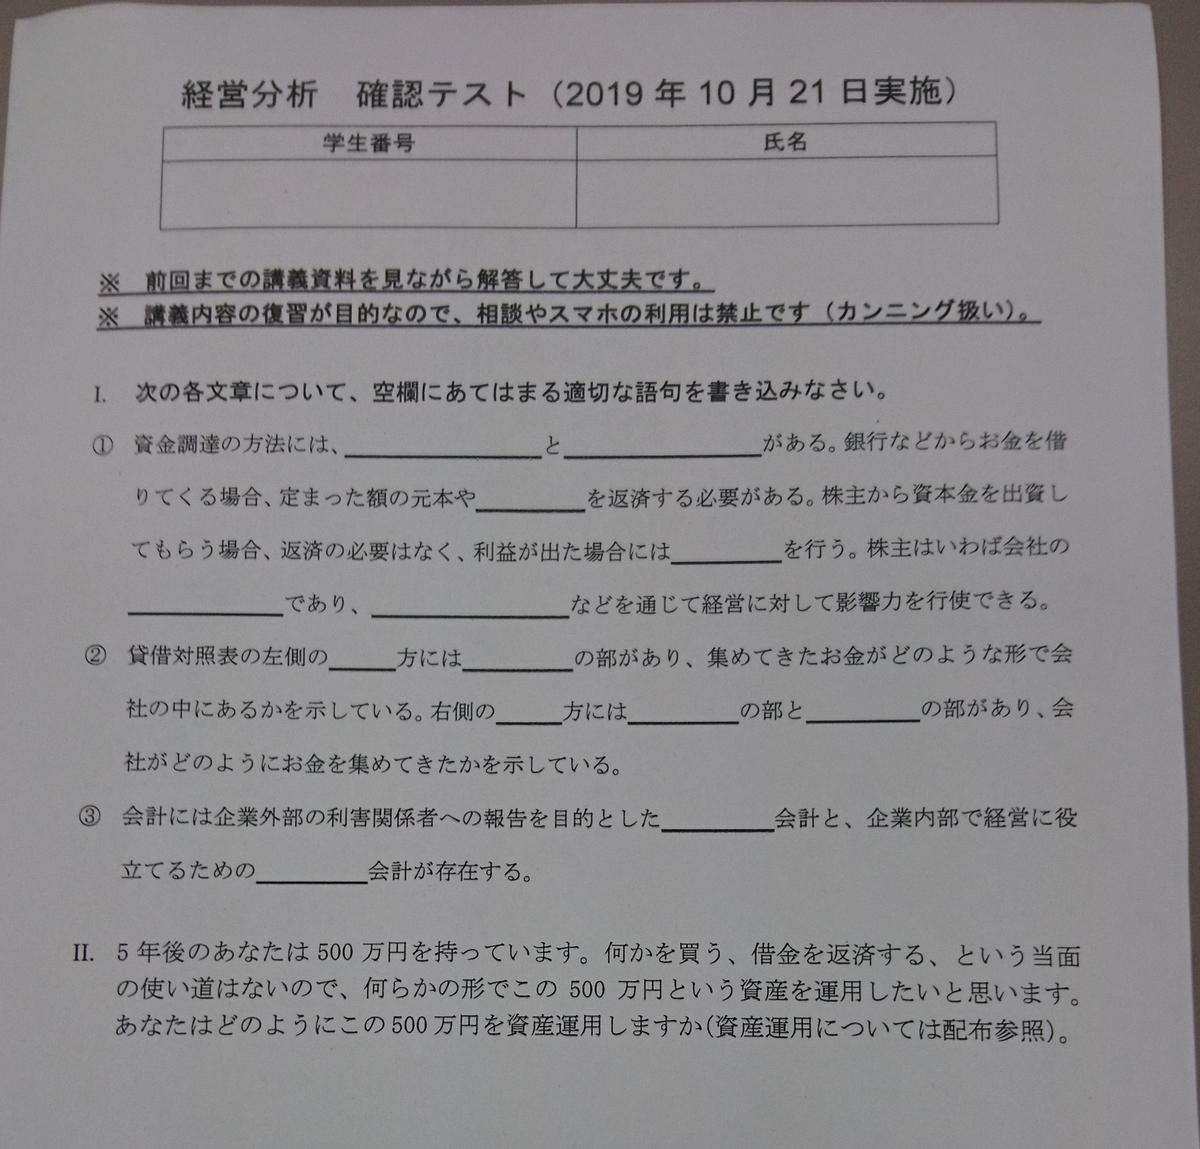 f:id:TakahisaWakabayashi:20191021230457j:plain